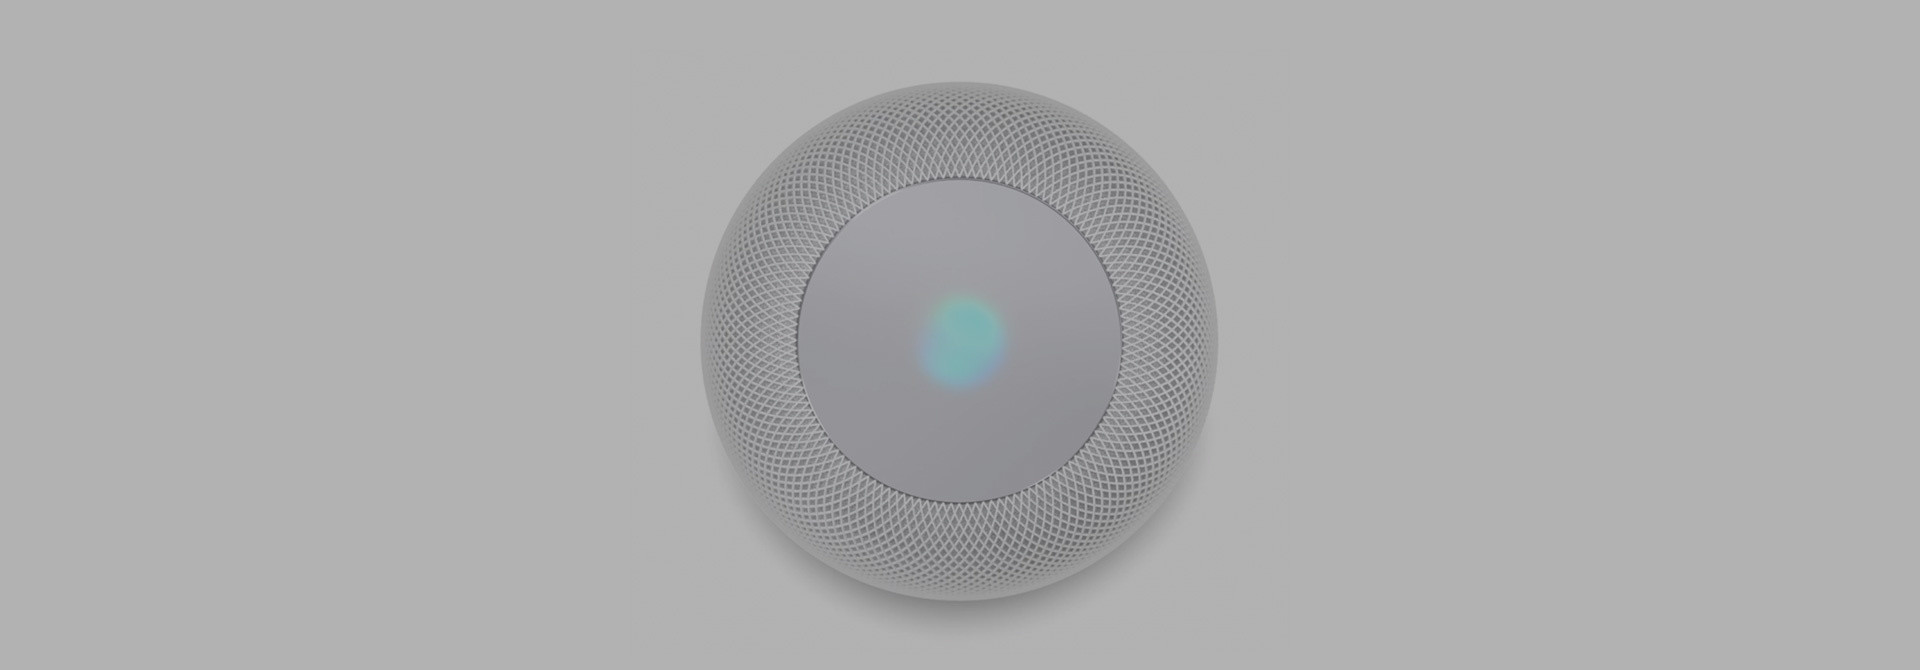 Apple HomePod Coaster